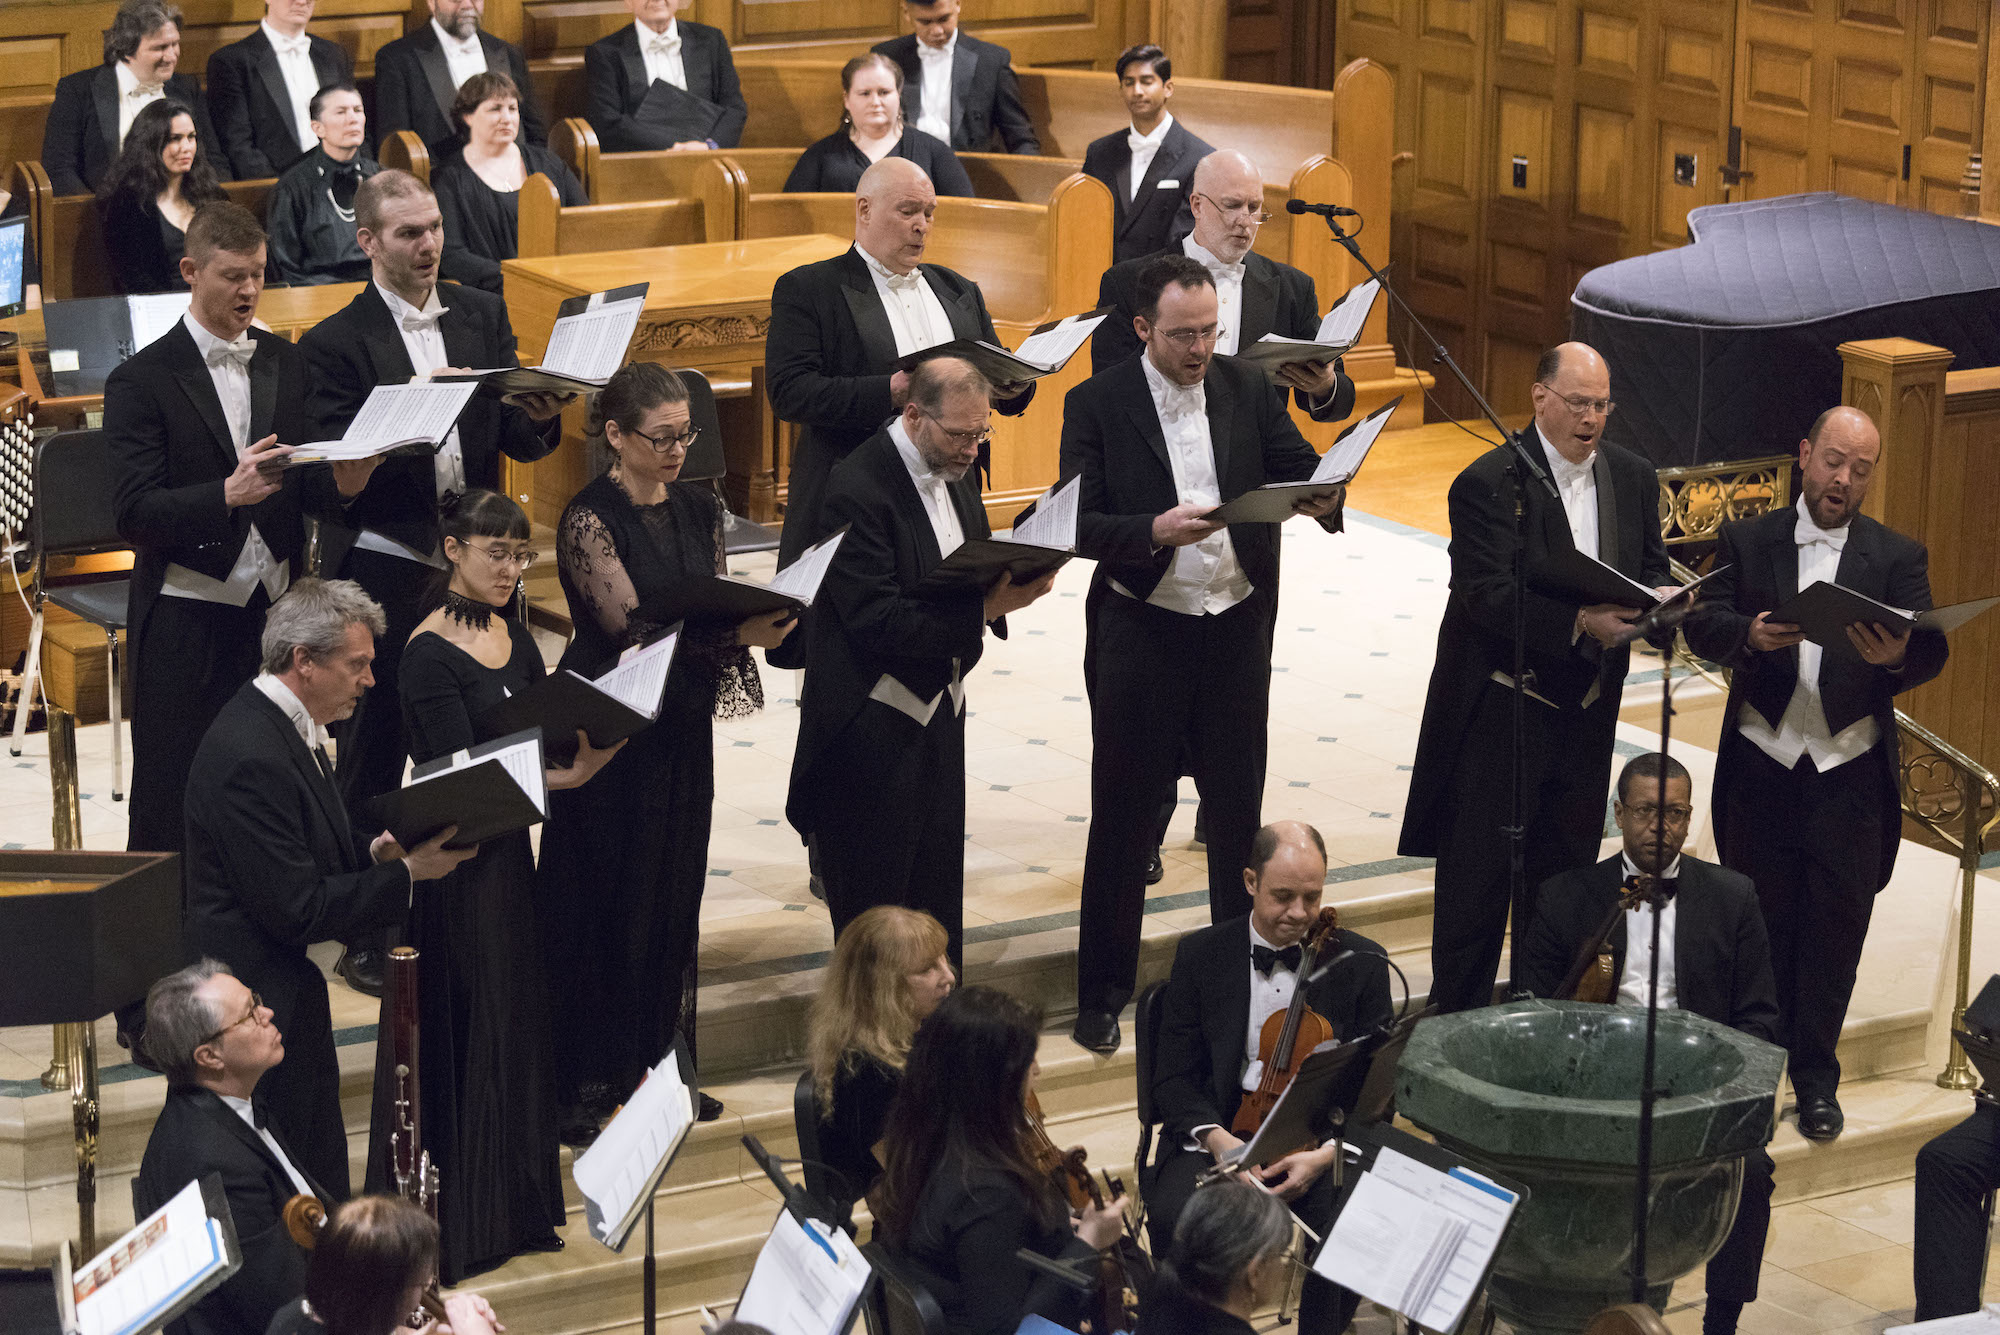 114-Jacob and His Twelve Sons.Ensemble.jpg